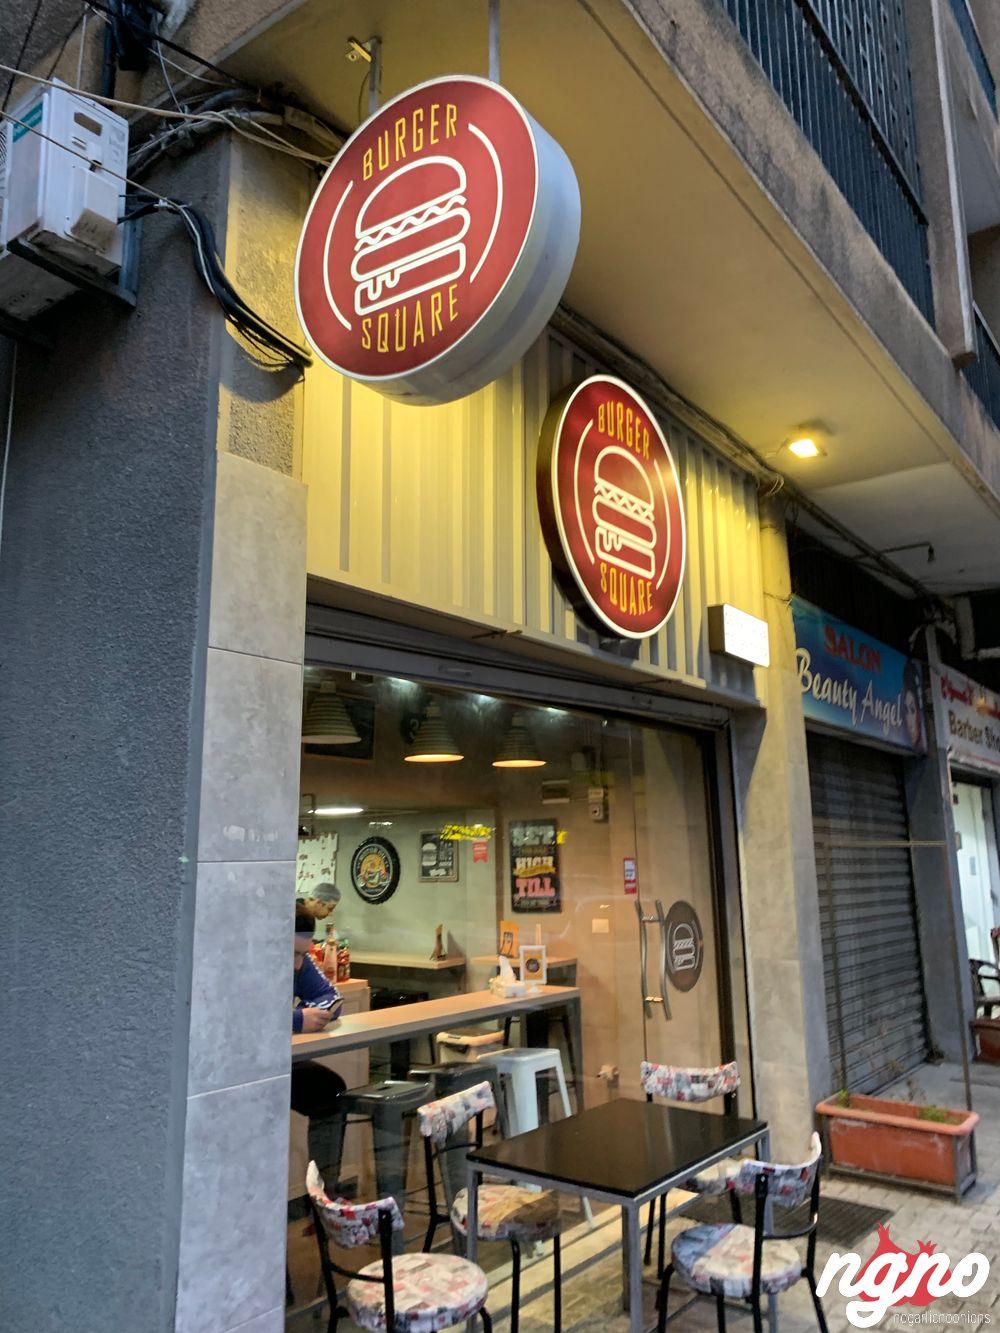 burger-square-tripoli-nogarlicnoonions-452019-03-06-04-23-35